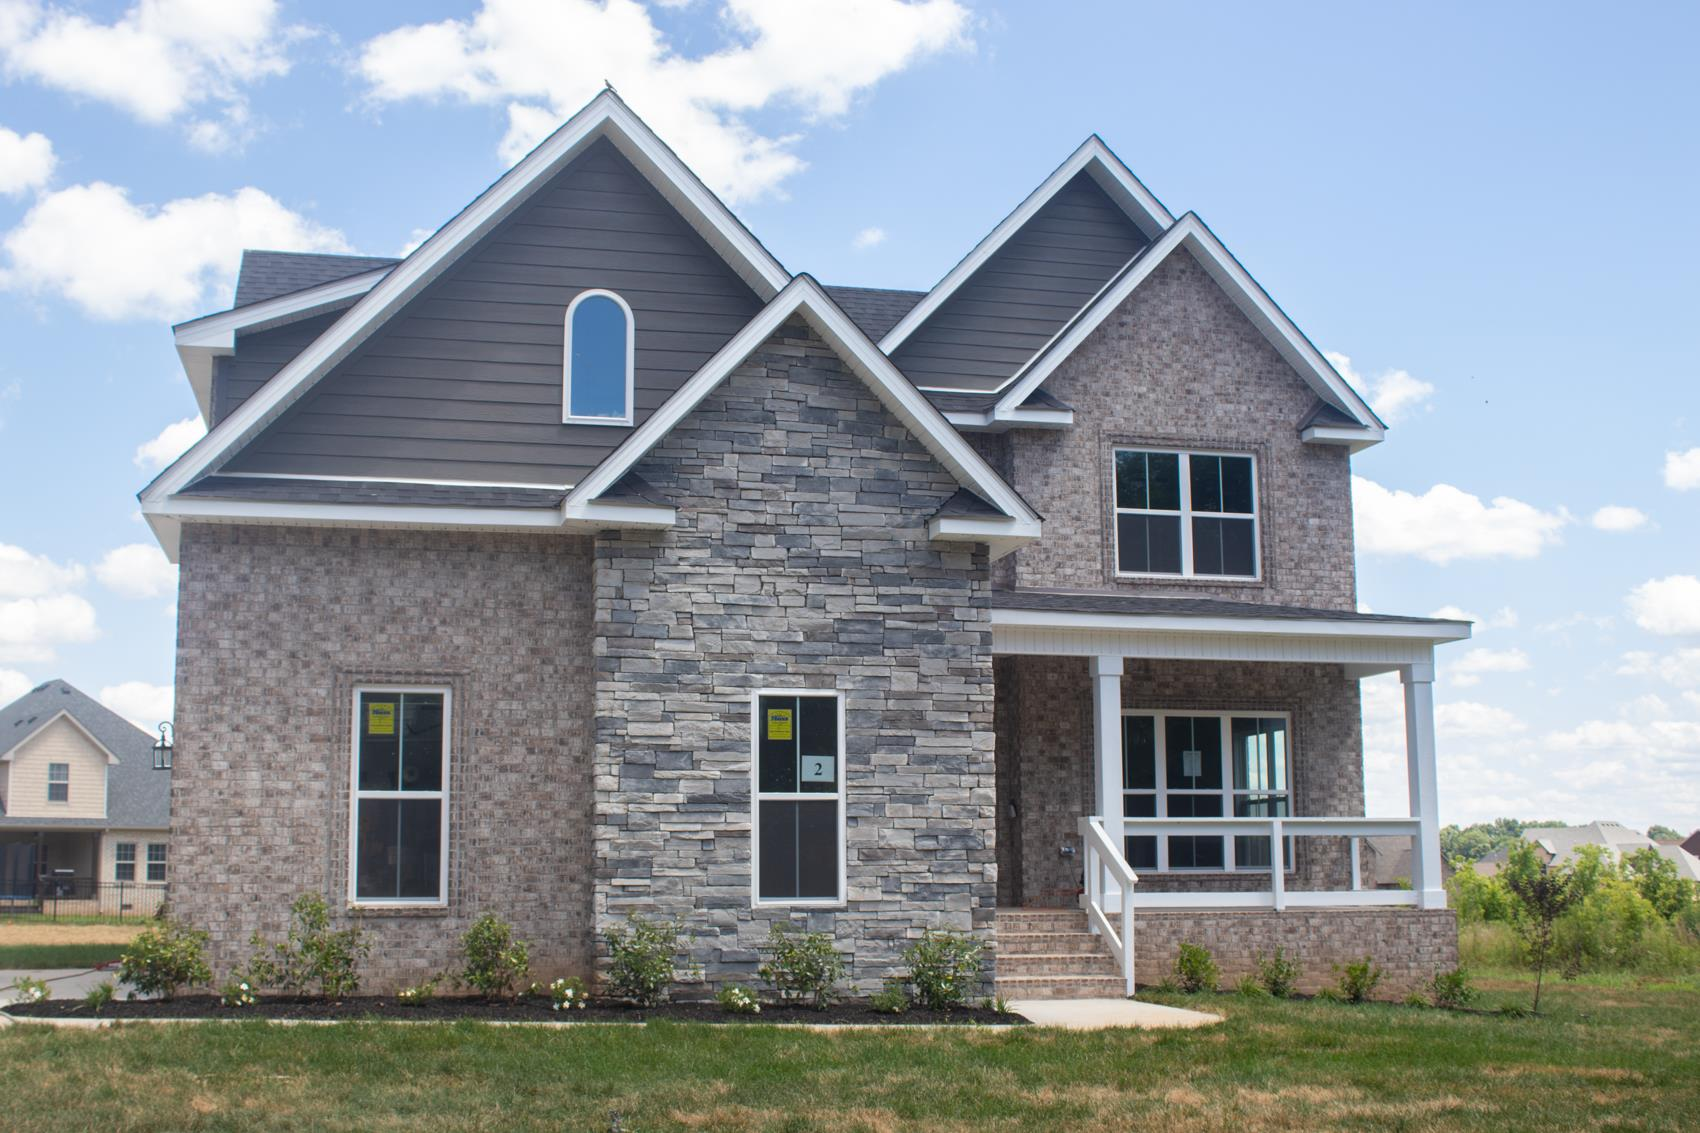 2 Hartley Hills, Clarksville, TN 37043 - Clarksville, TN real estate listing